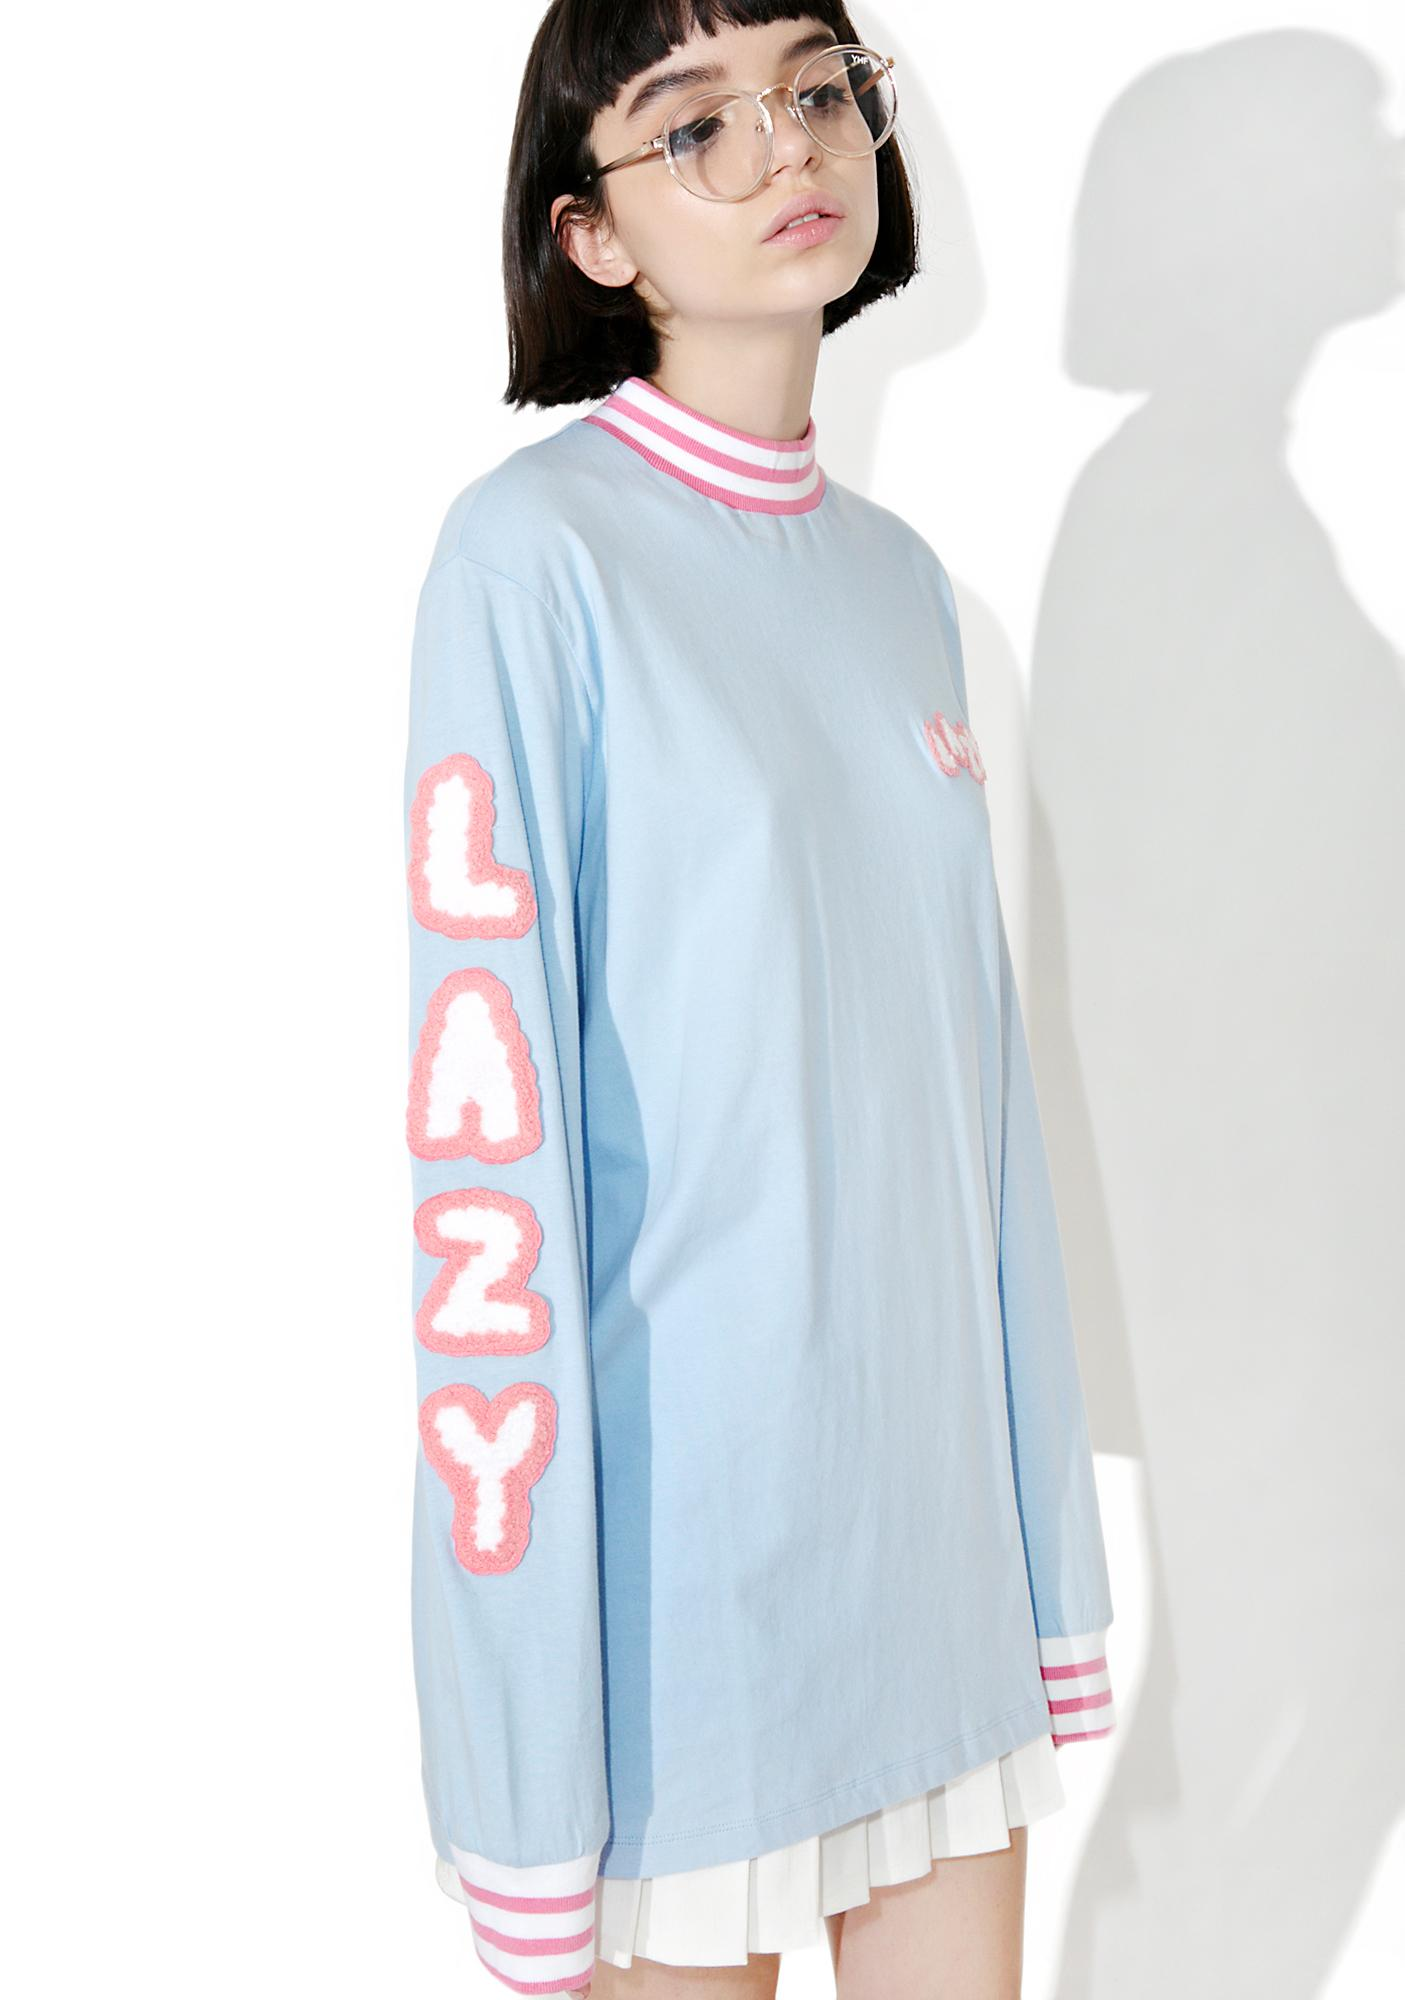 Lazy Oaf Lazy Letters Long Sleeve Tee